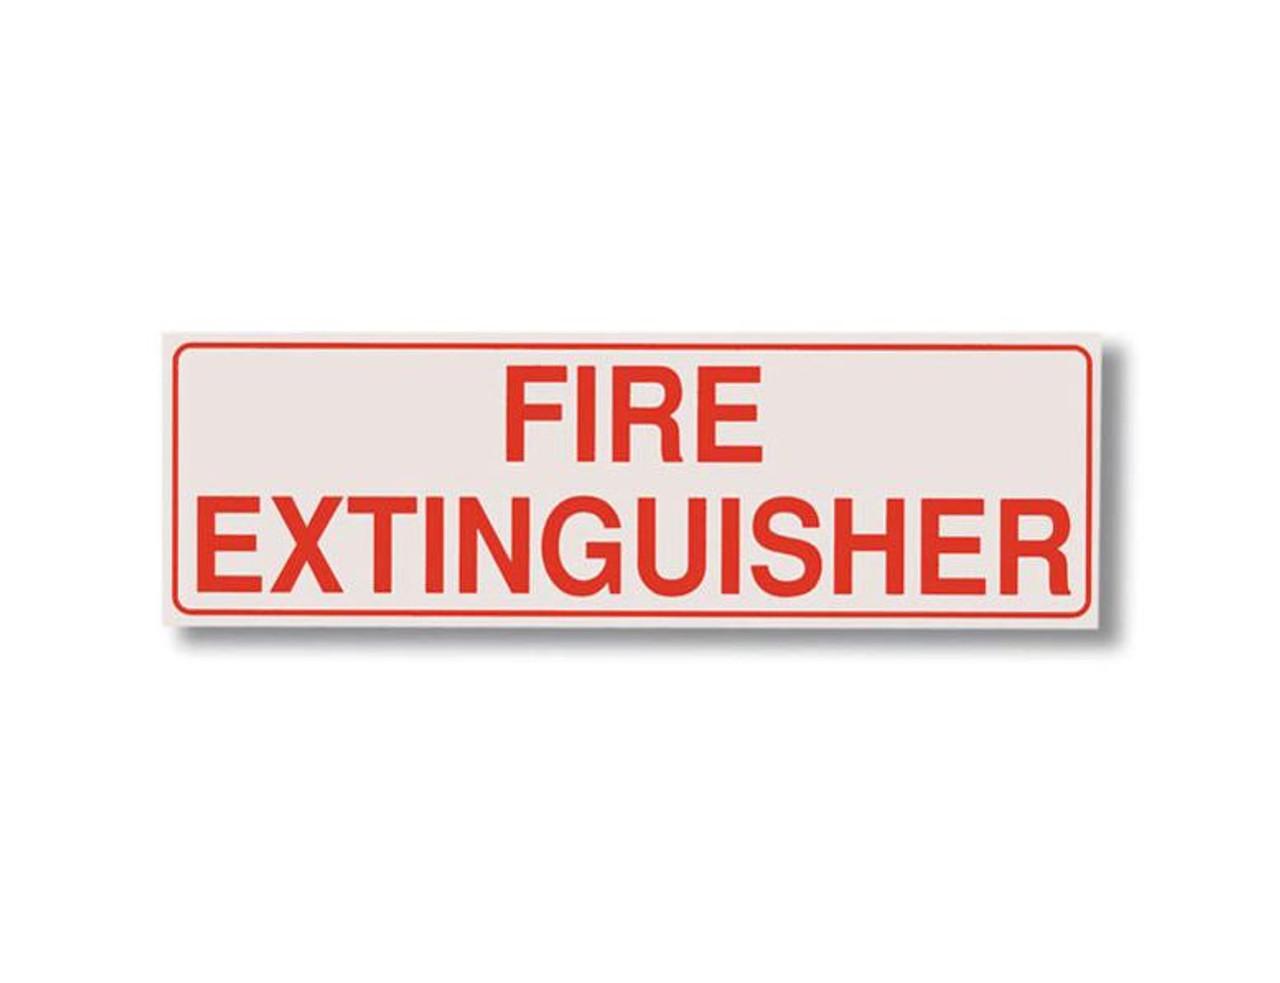 BL254  - Fire Extinguisher Cabinet Decals BL254